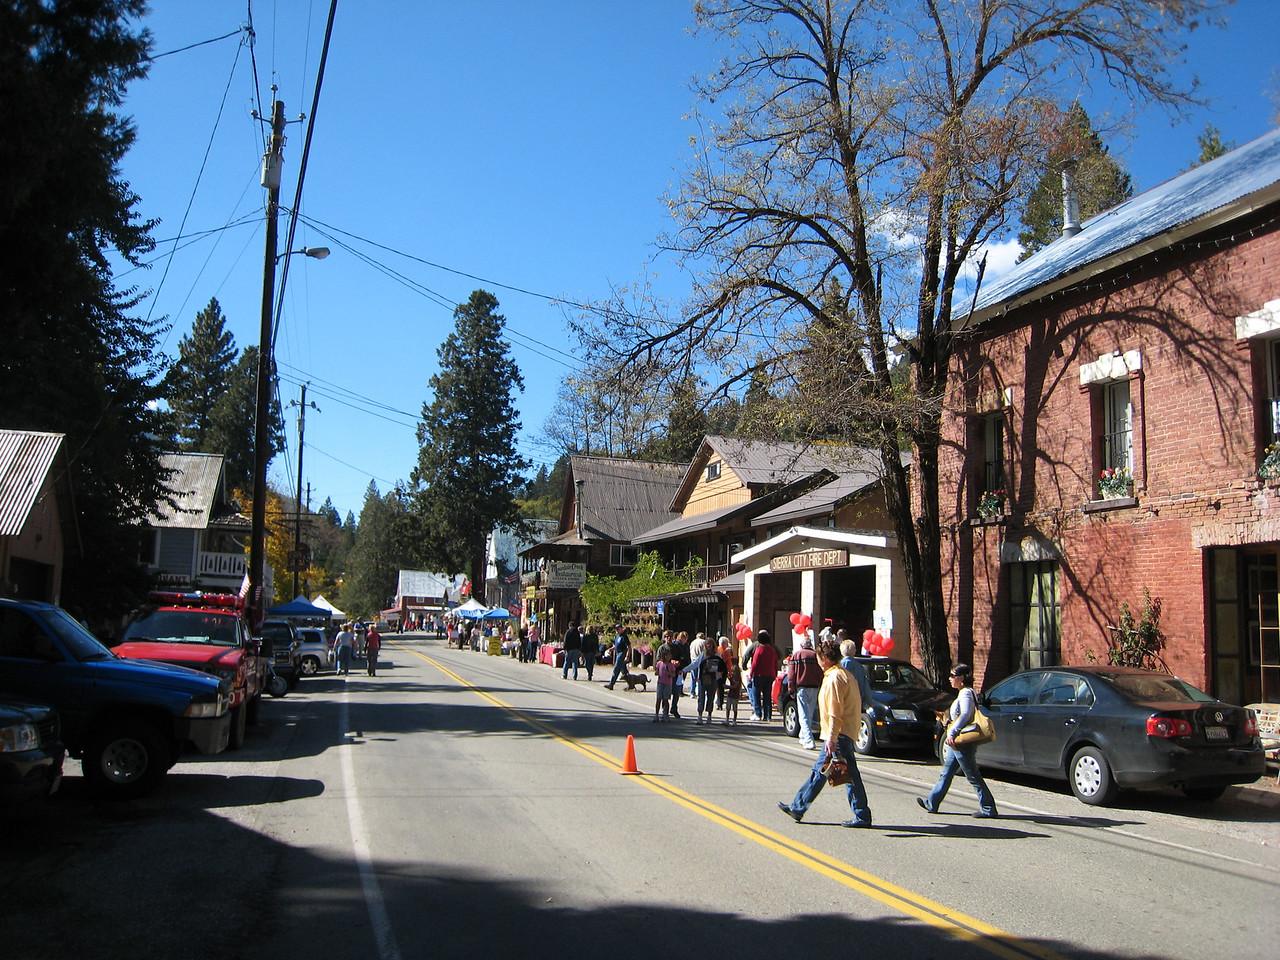 Sierra City Oktoberfest!  This place is hoppin'